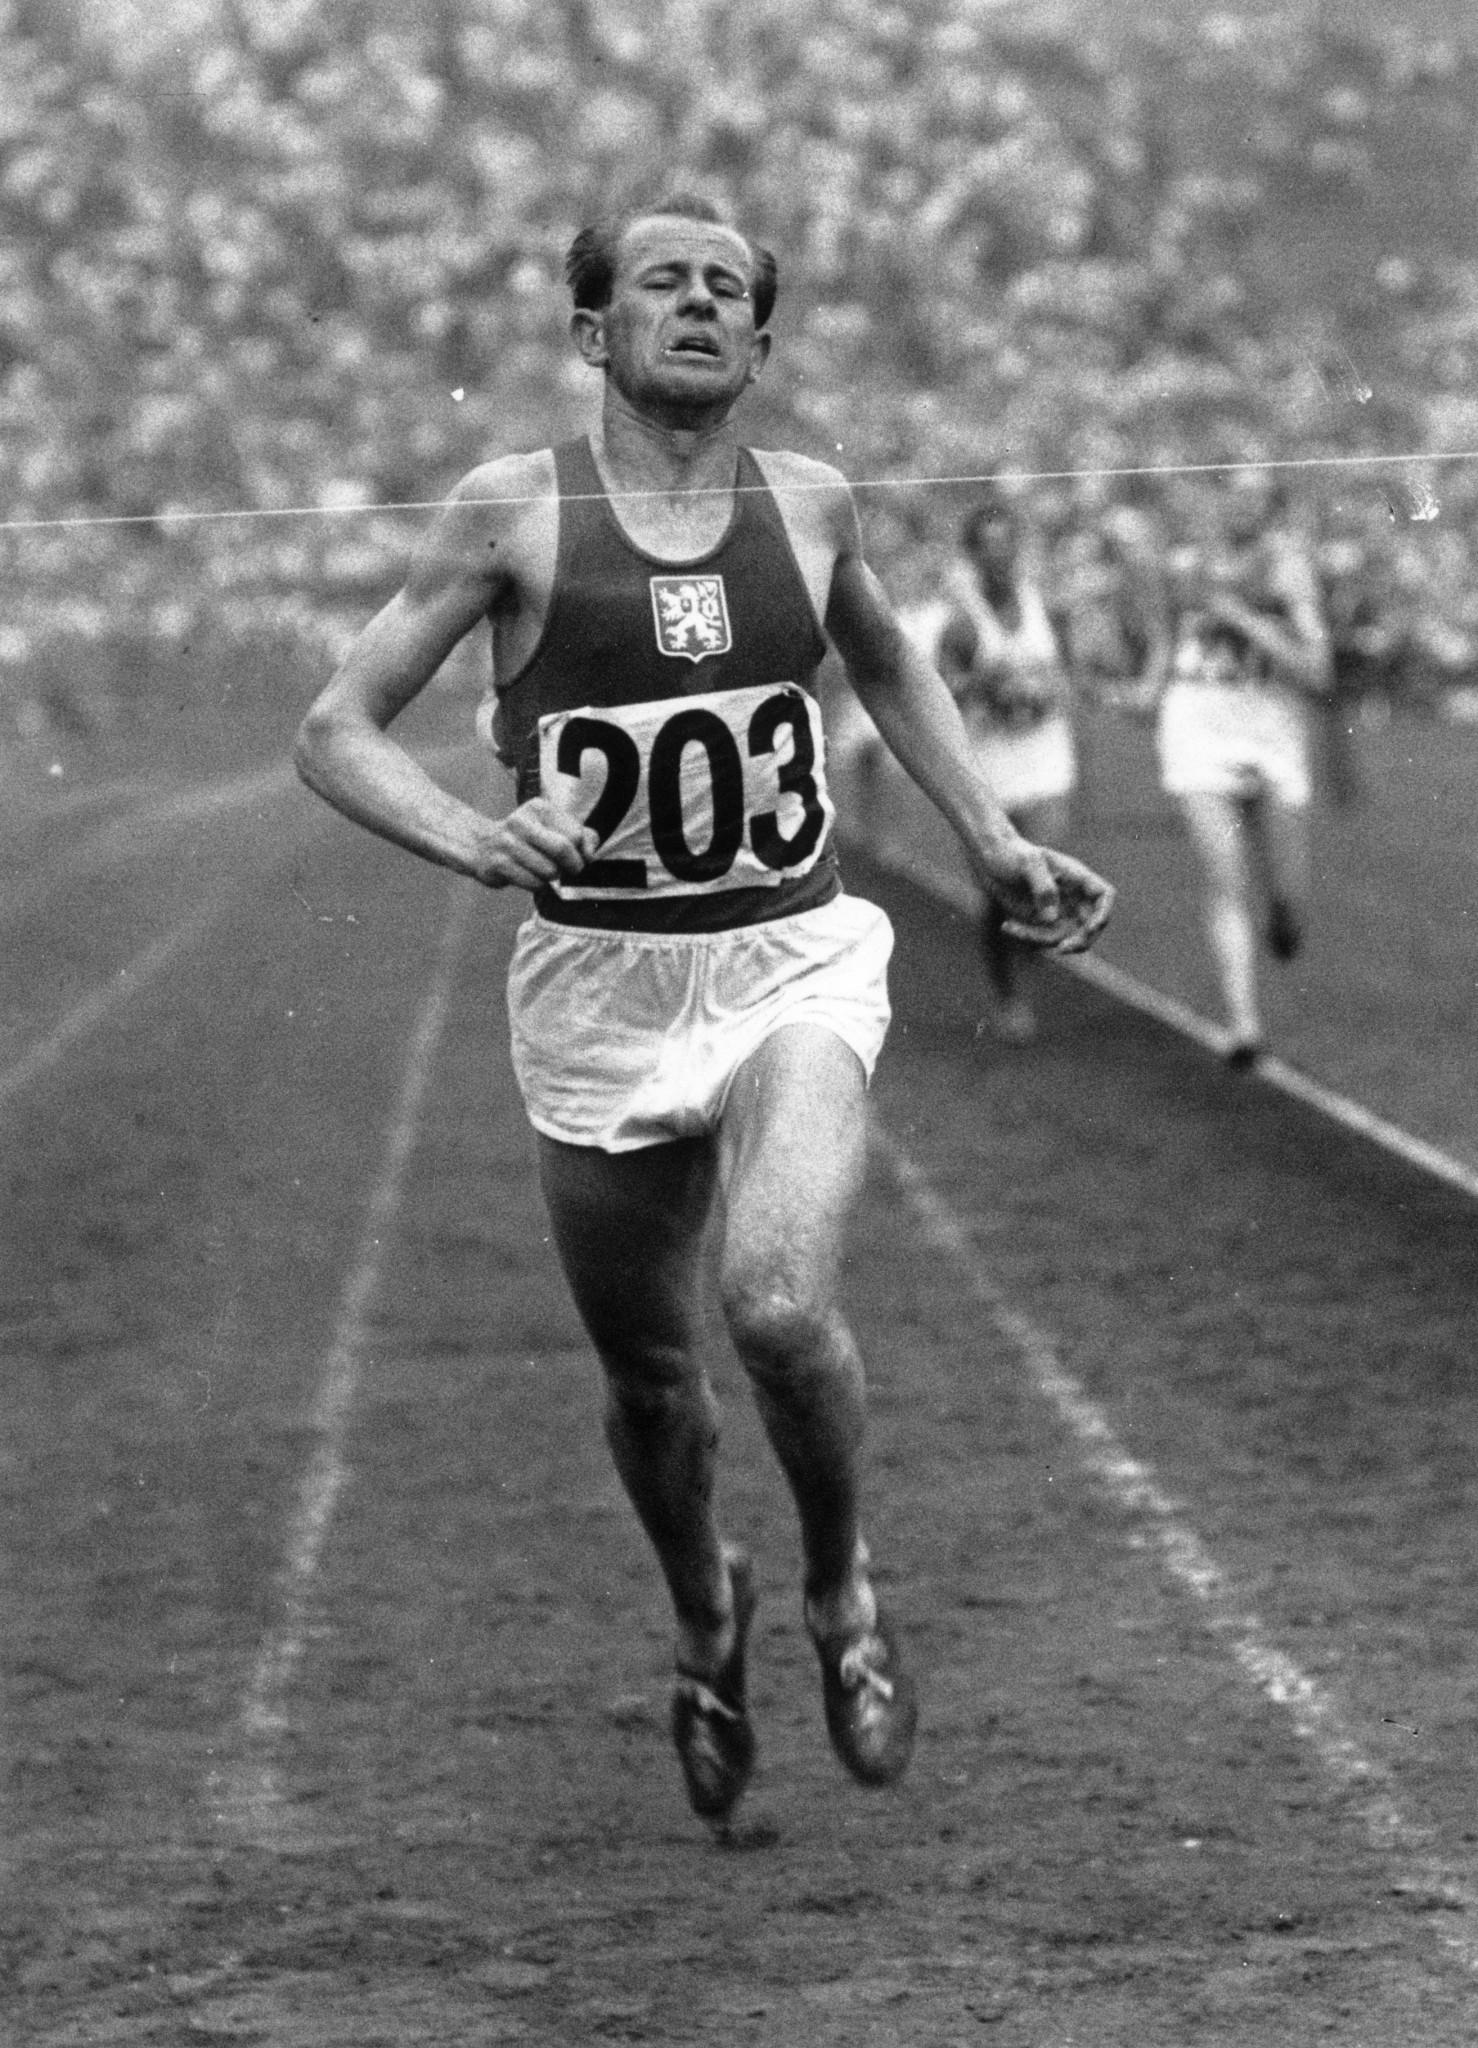 Czech runner Emil Zatopek wins 1500m at 1947 International University Games. ©Keystone/Getty Images